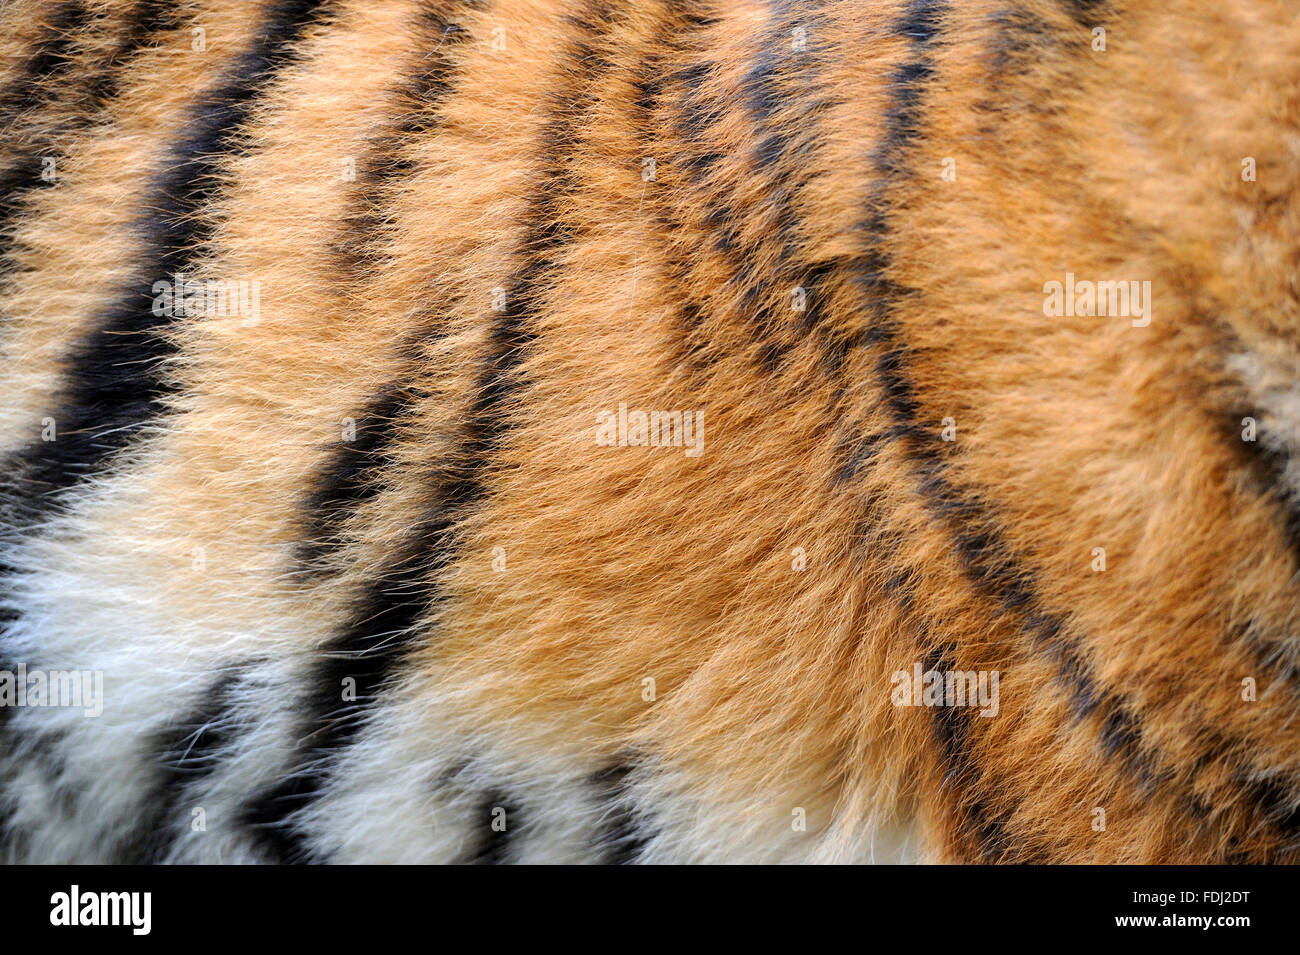 Close-up la texture de peau de tigre réel Photo Stock